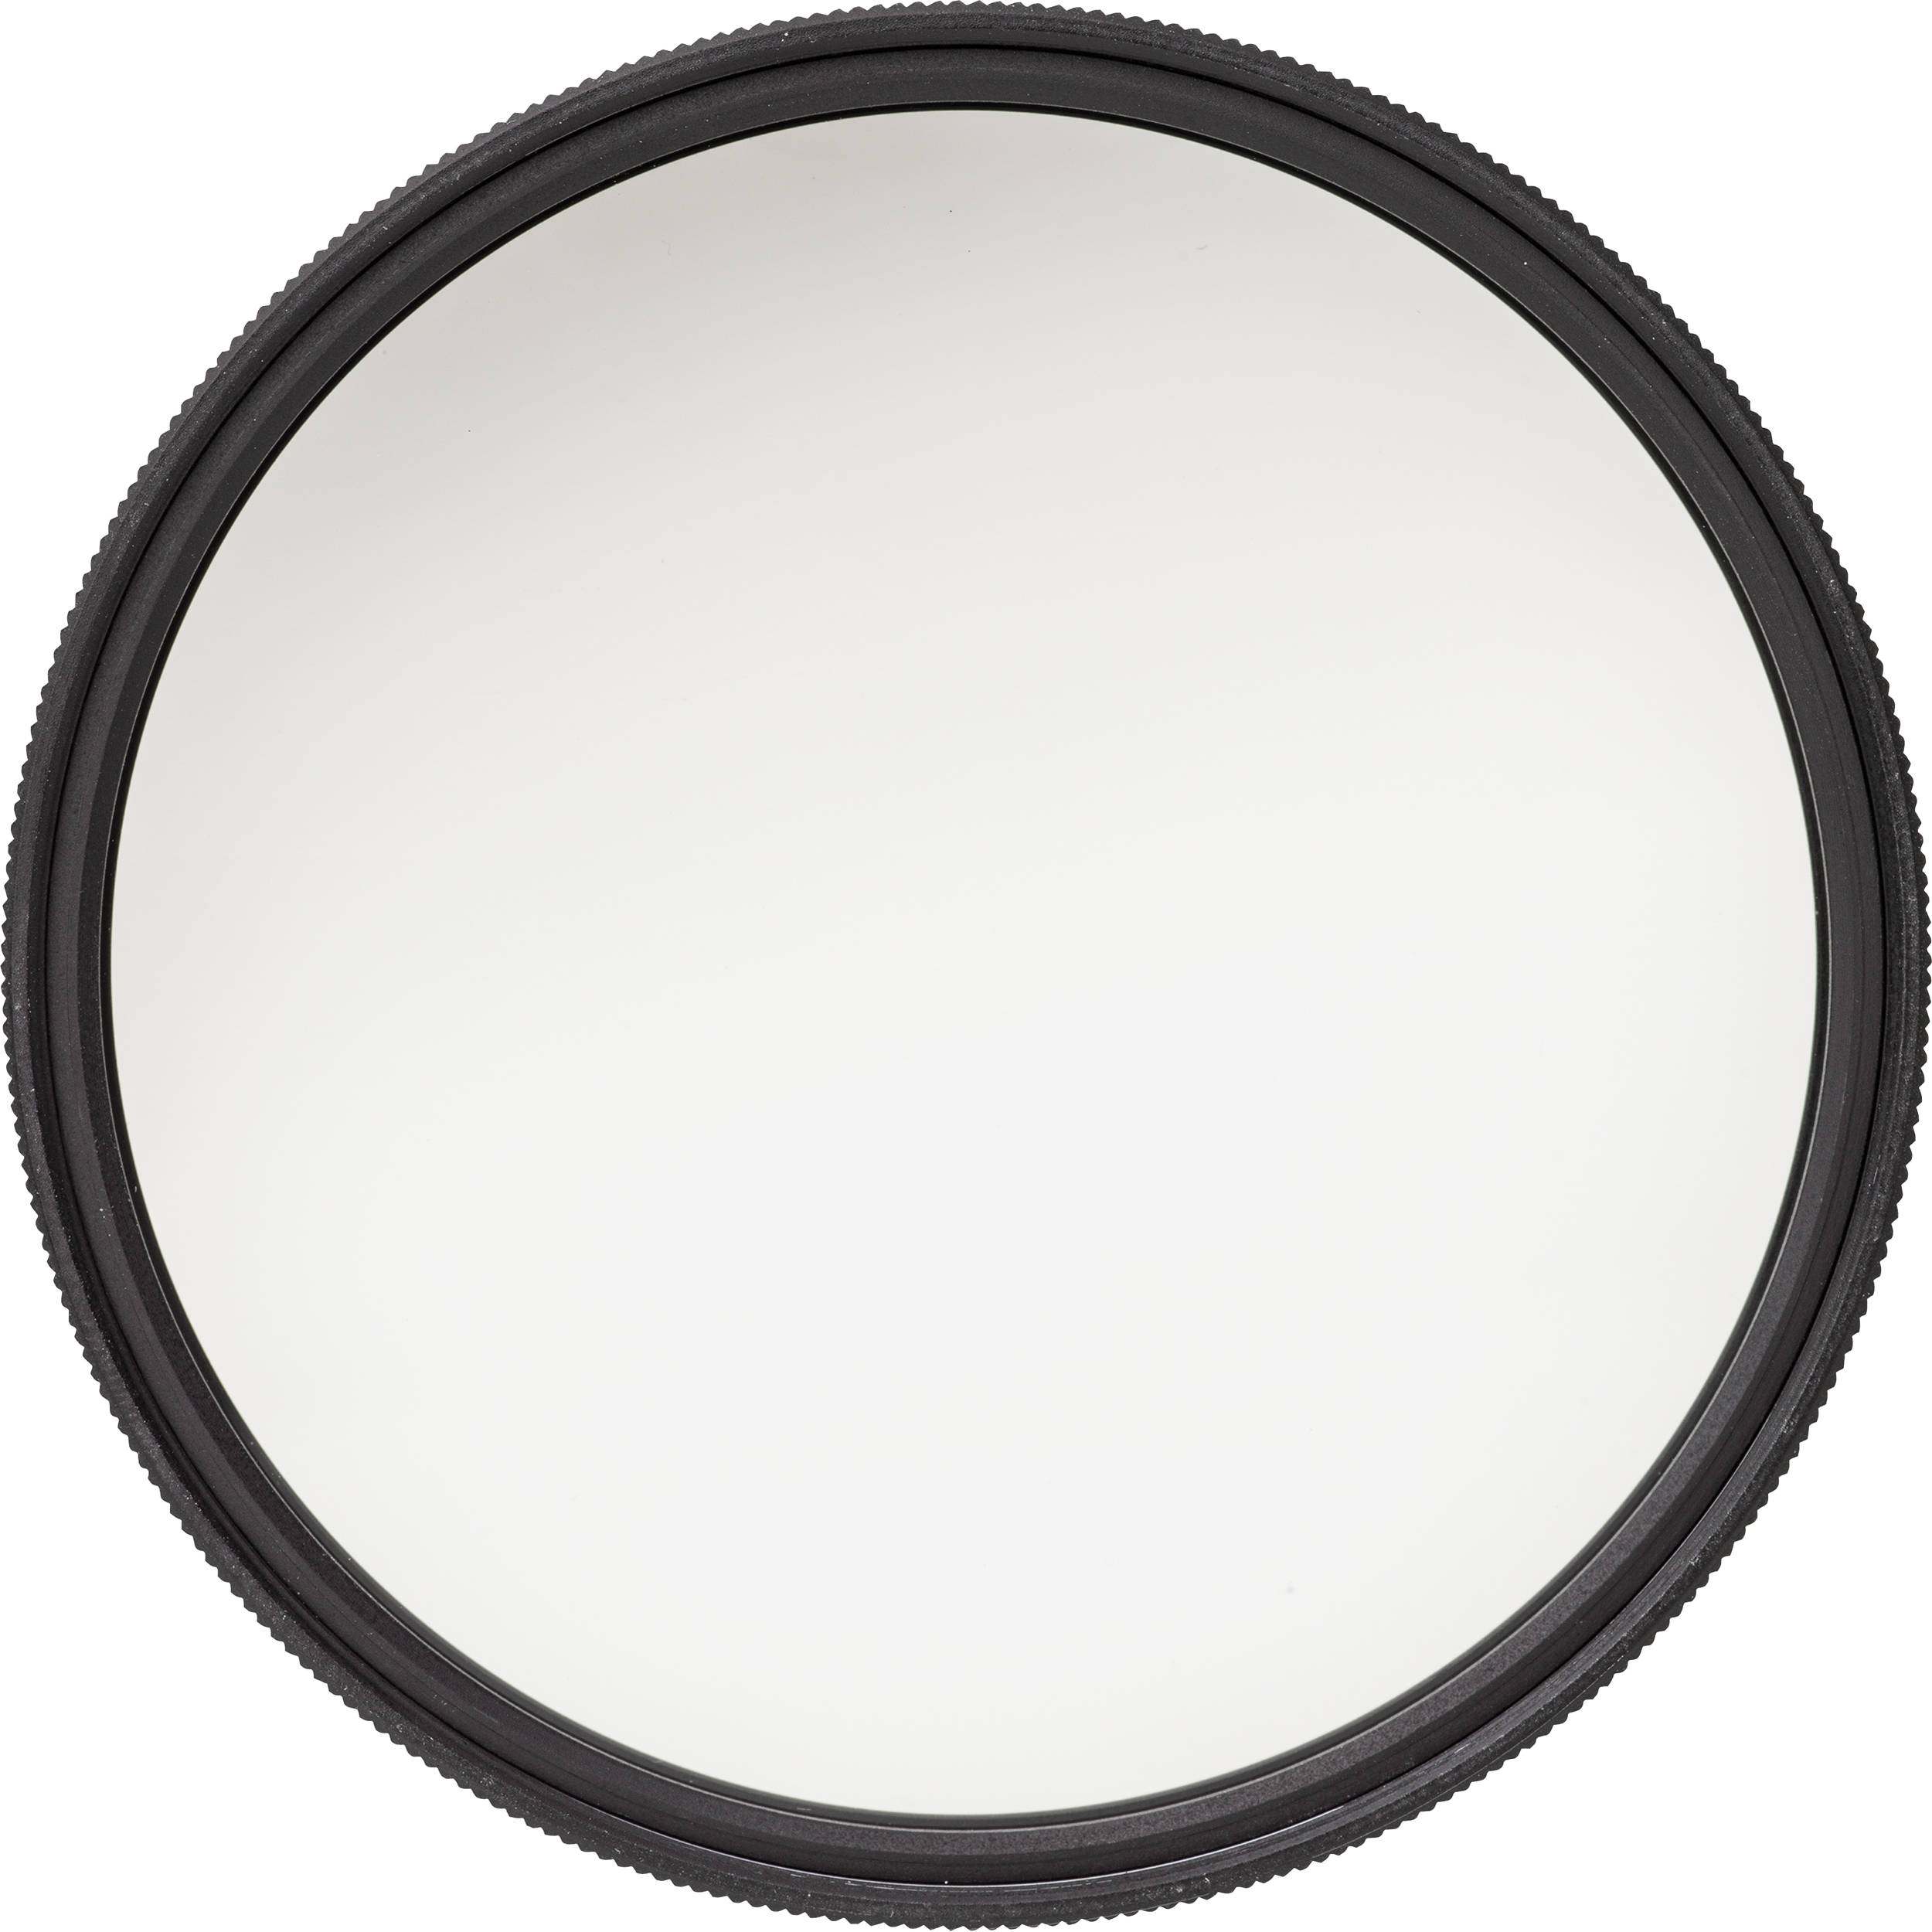 Heliopan 58mm Graduated Neutral Density 03 Filter